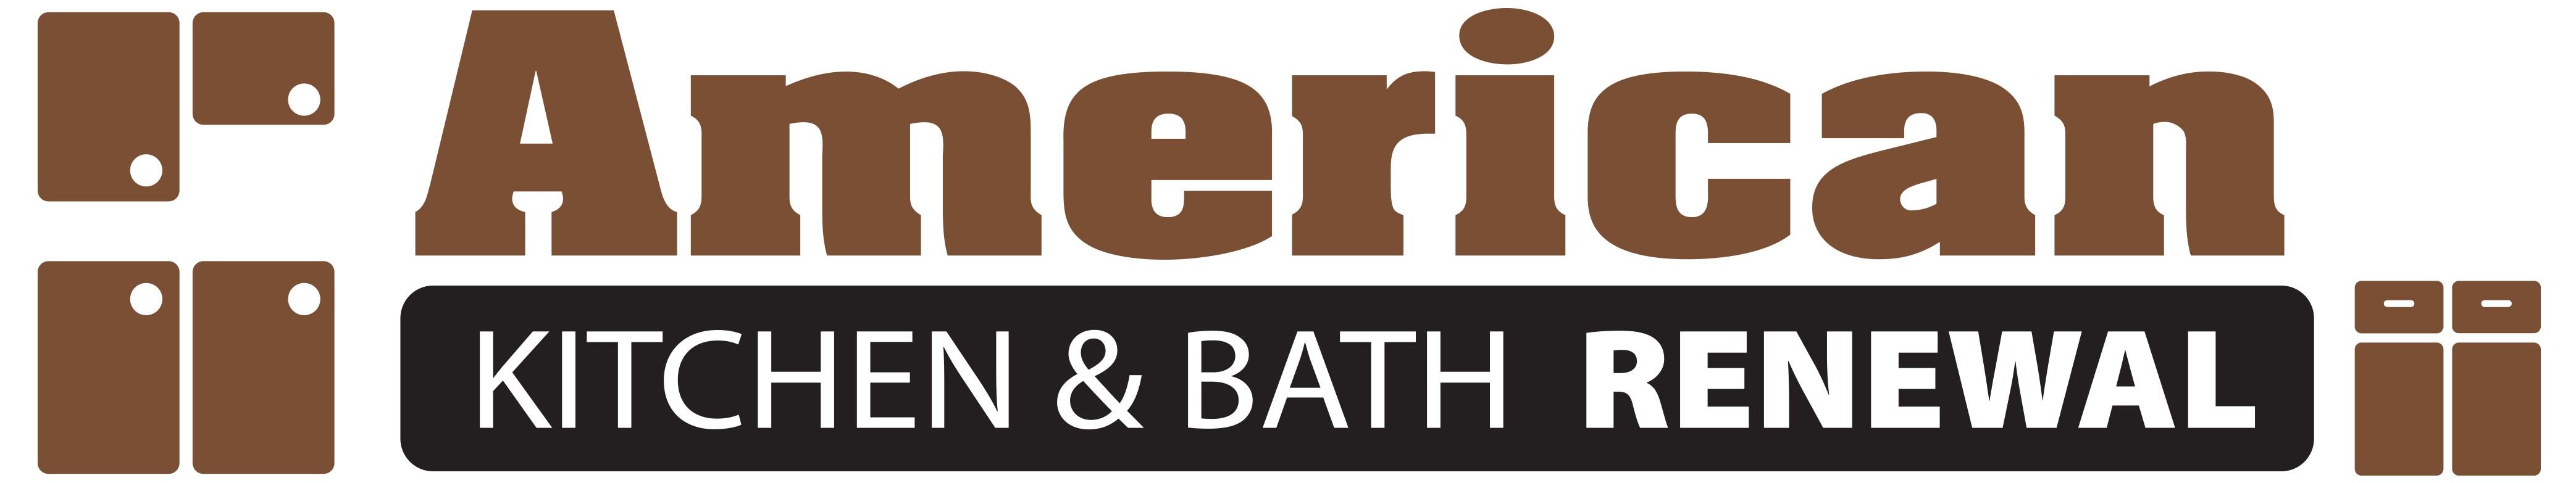 American Kitchen and Bath Renewal logo